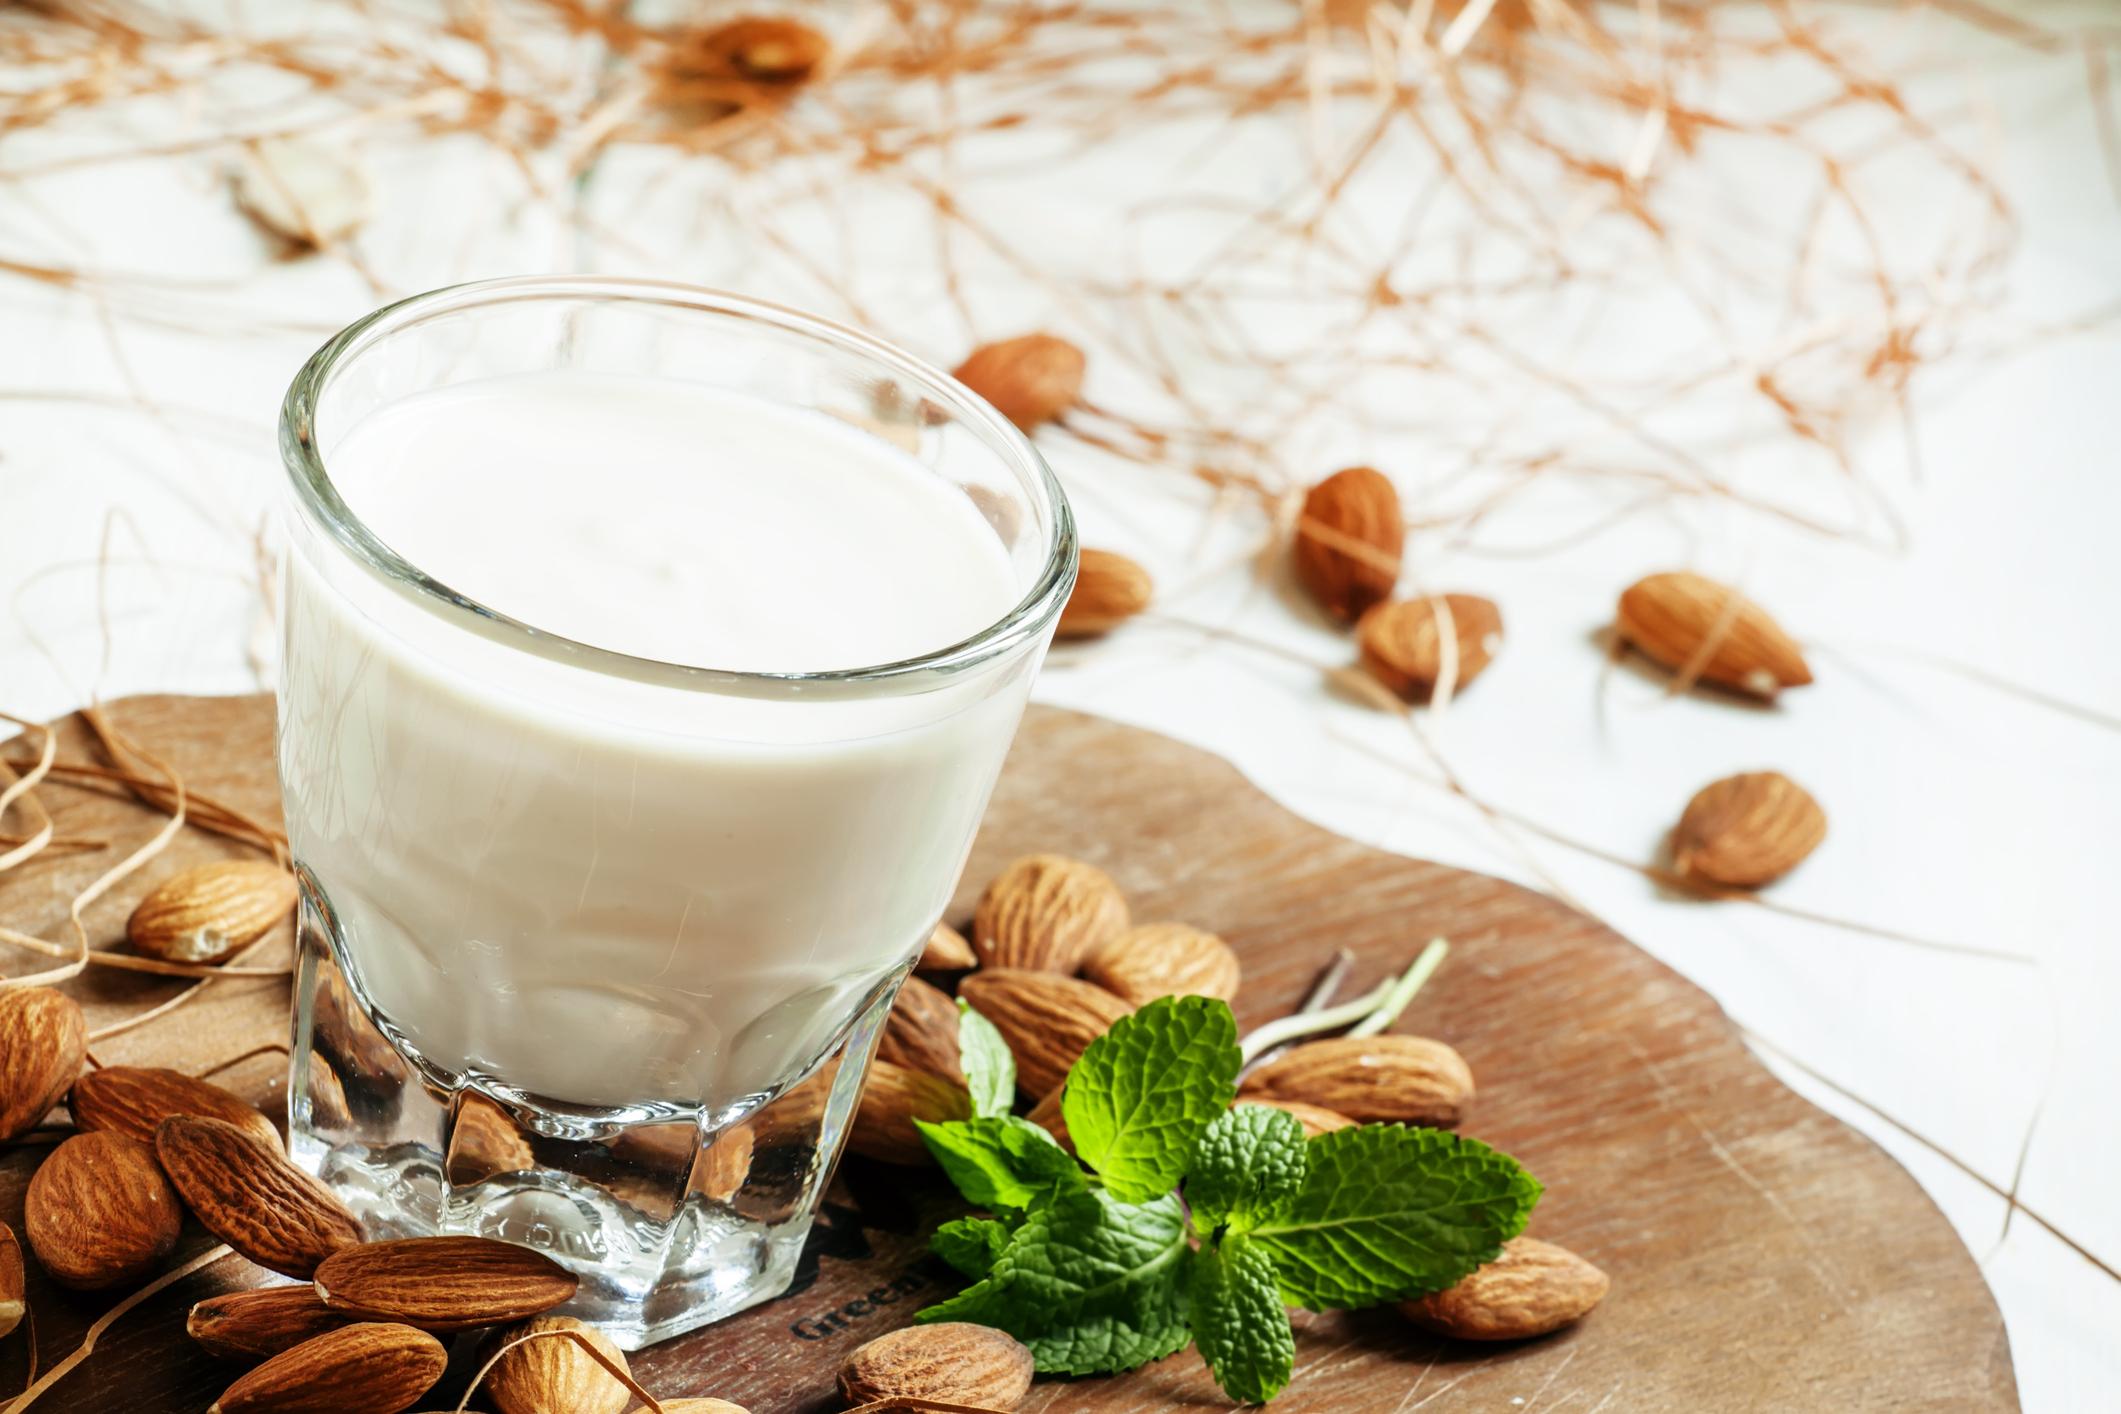 5-vegan-milks-to-try